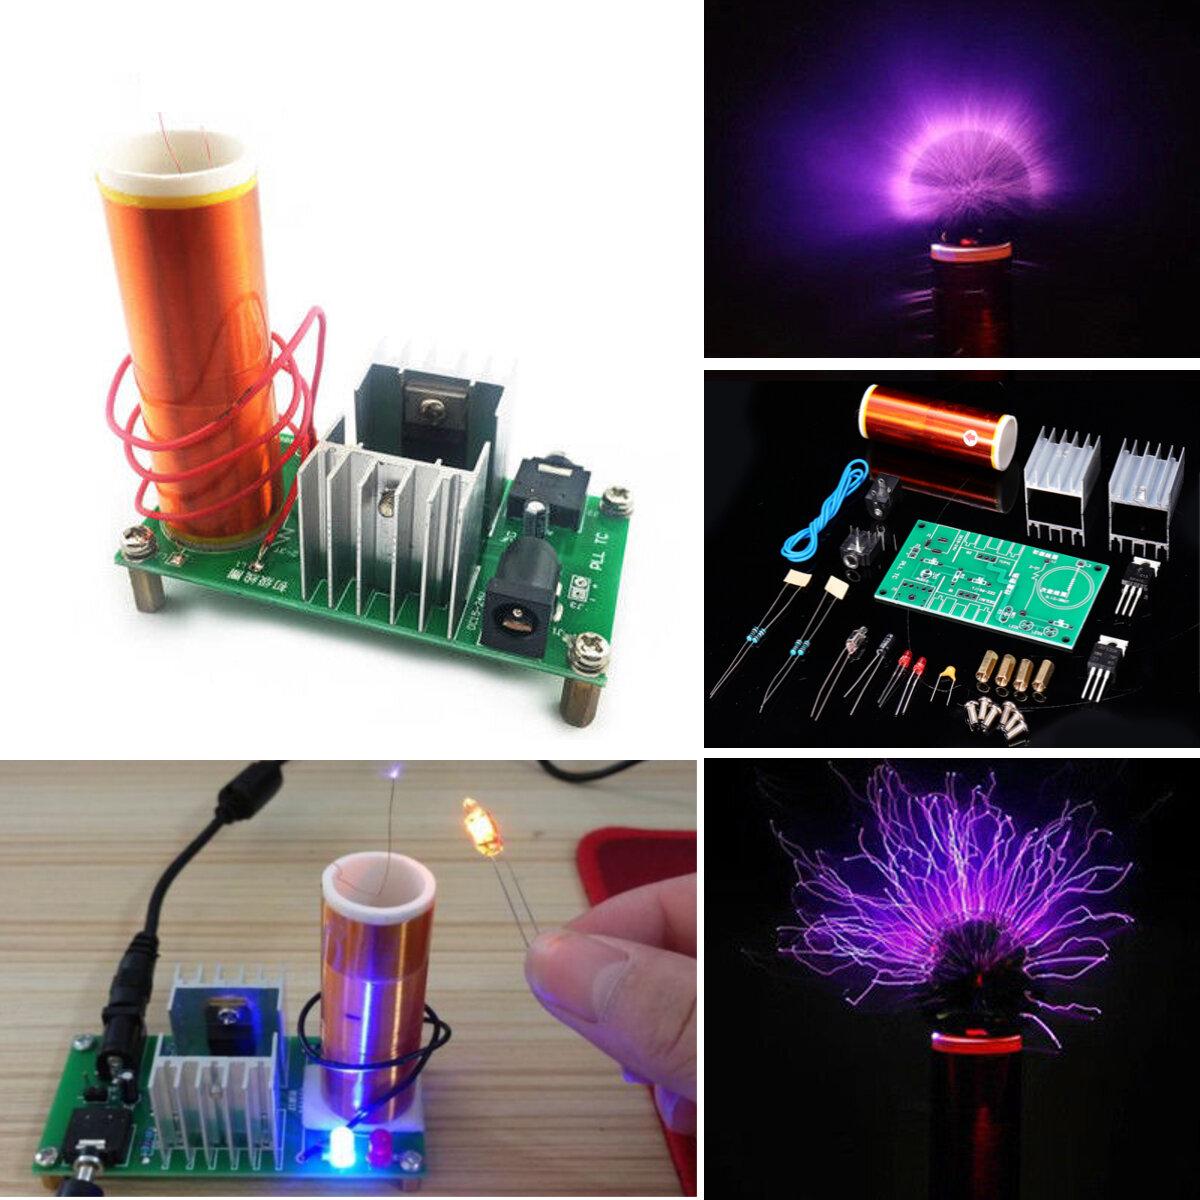 Geekcreit® DIY Mini Tesla Coil Module Unassembled 15W DC 15-24V 2A Plasma Speaker Electronic Kit